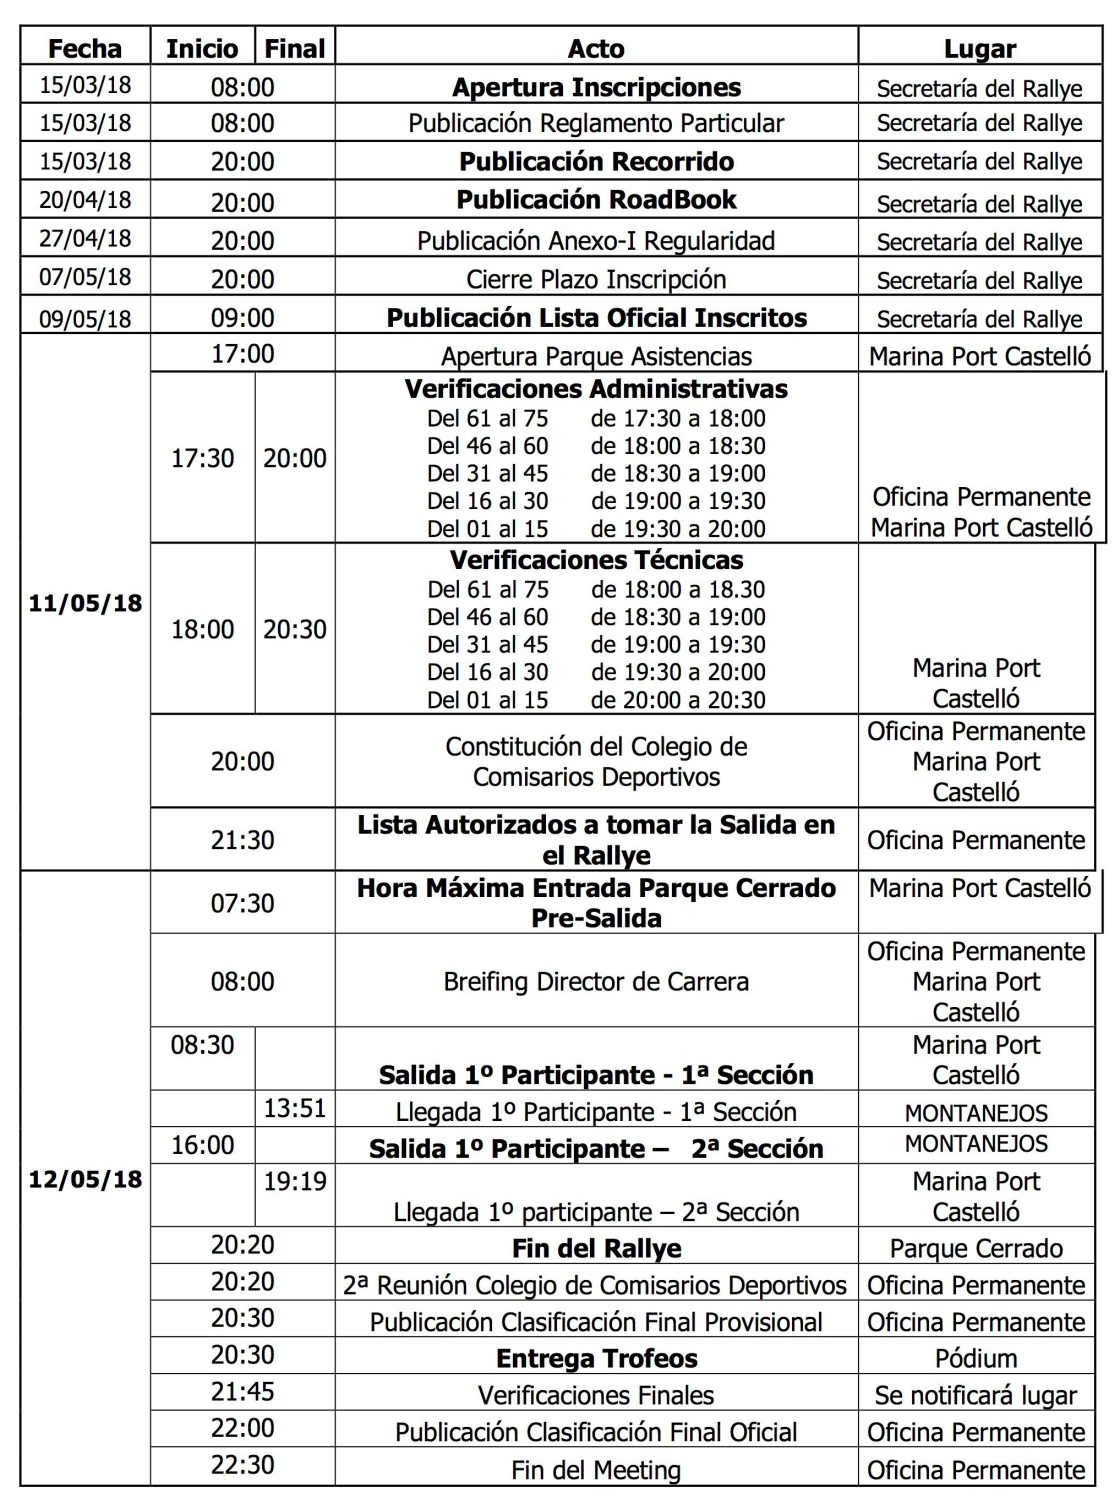 cuadro-horario-rcac-2018.jpg